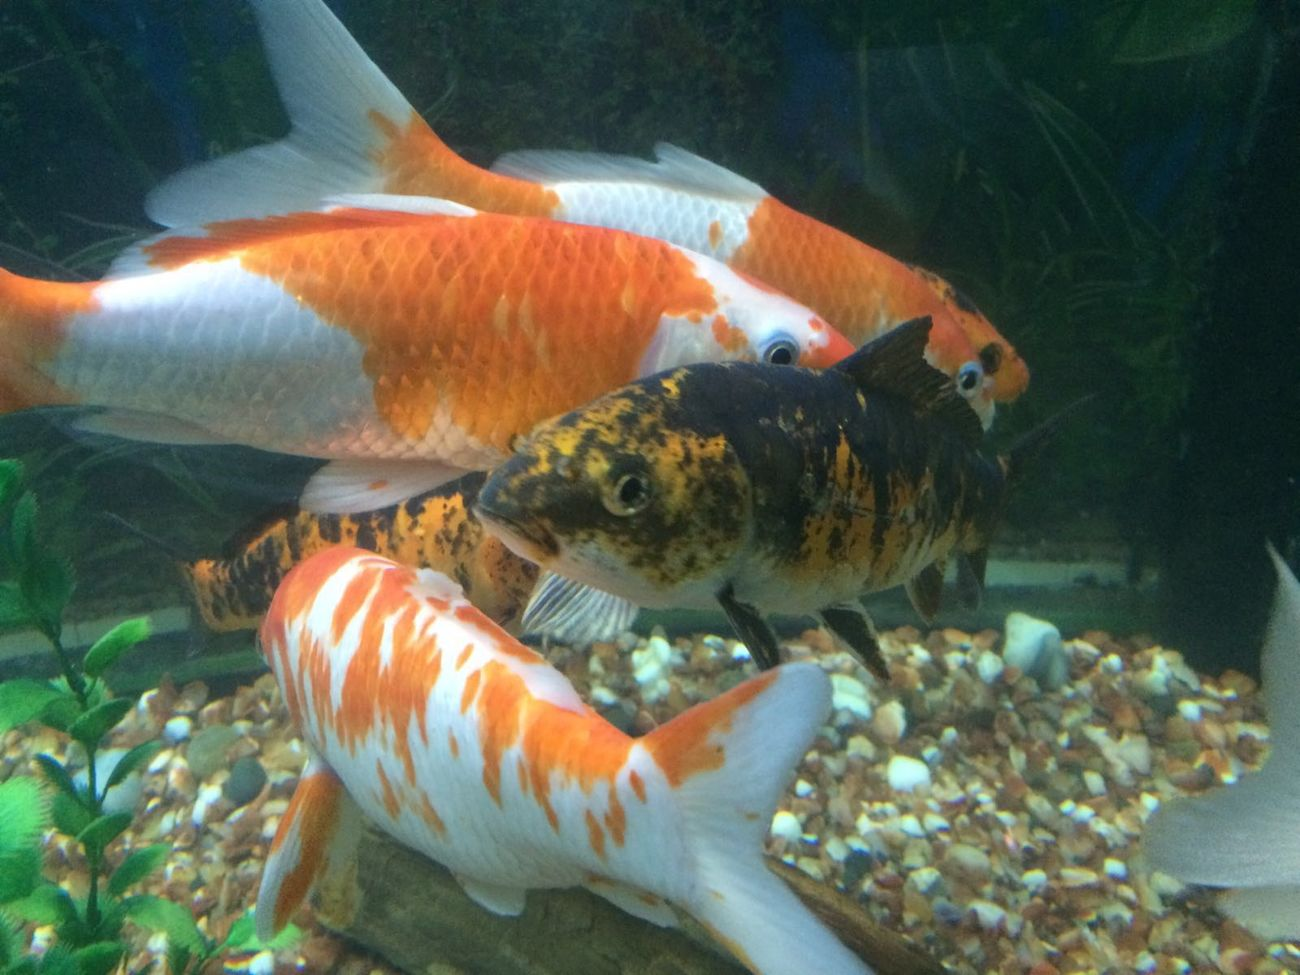 Acquarium Acquarium Park Goldfish Fish Tank FishEyeEm Fisheye EyeEmBestPics EyeEm Gallery Eye4photography  My Smartphone Life Taking Photos Enjoying Life Love U All From India With Love...